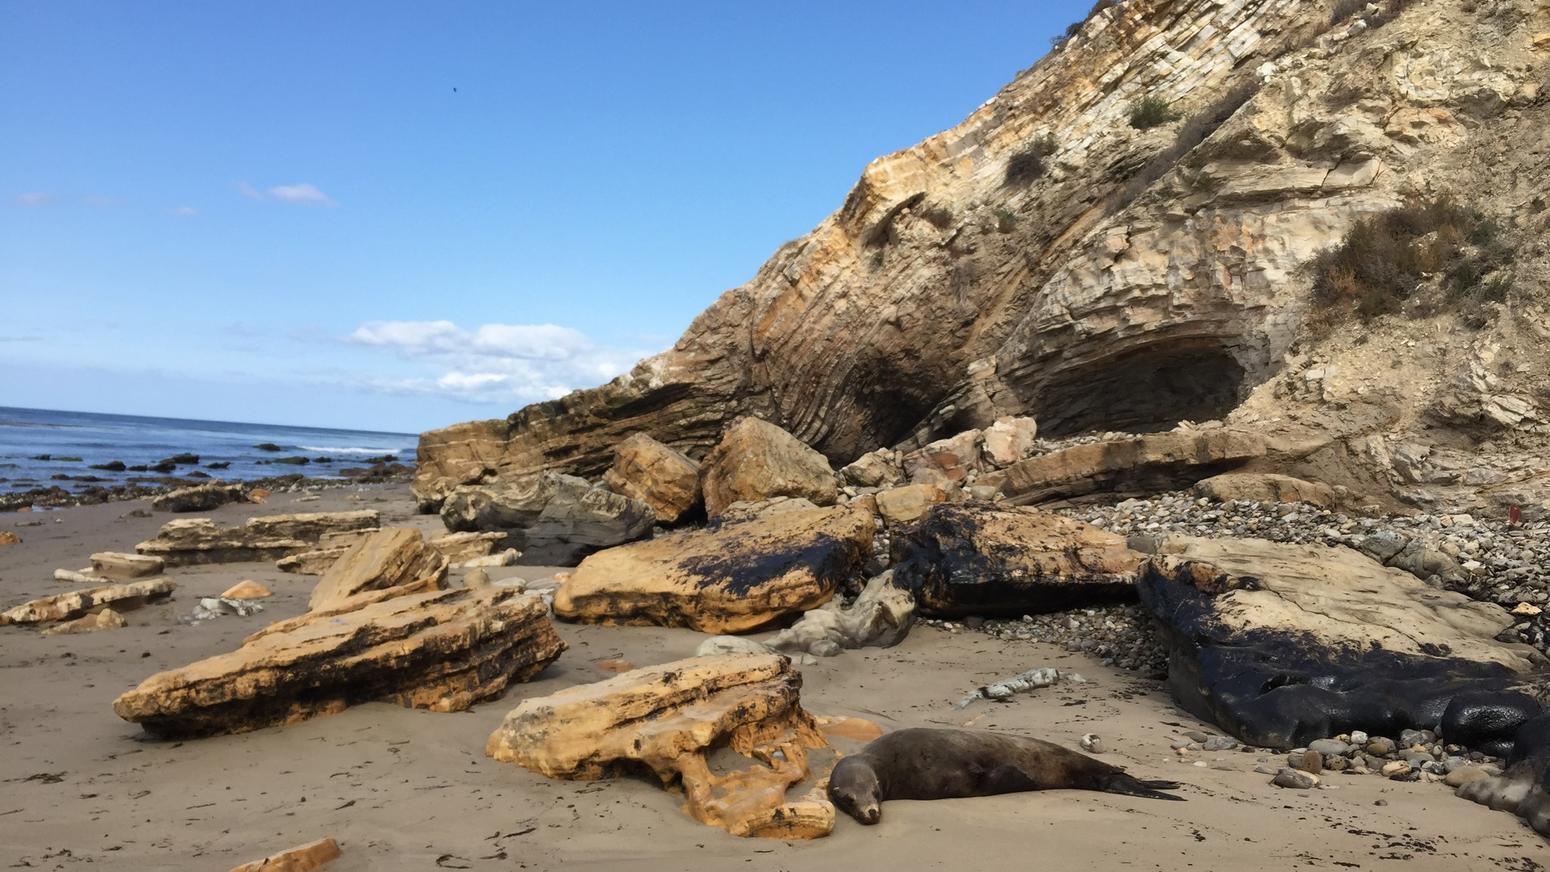 Oil spill on Santa Barbara County coast